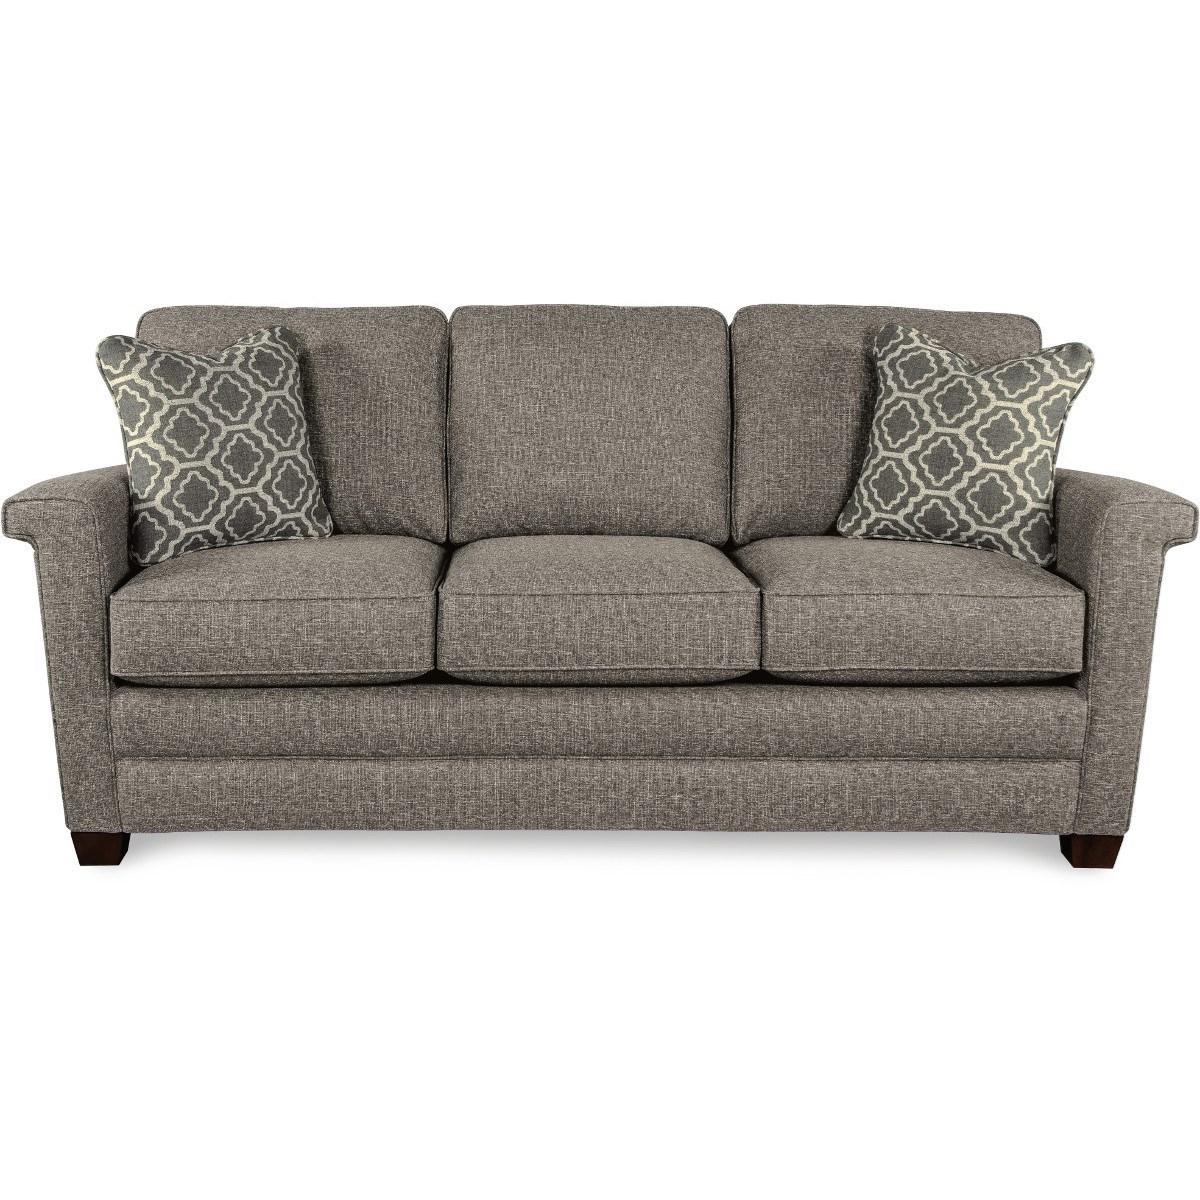 Bexley Sofa by La-Z-Boy at Houston's Yuma Furniture